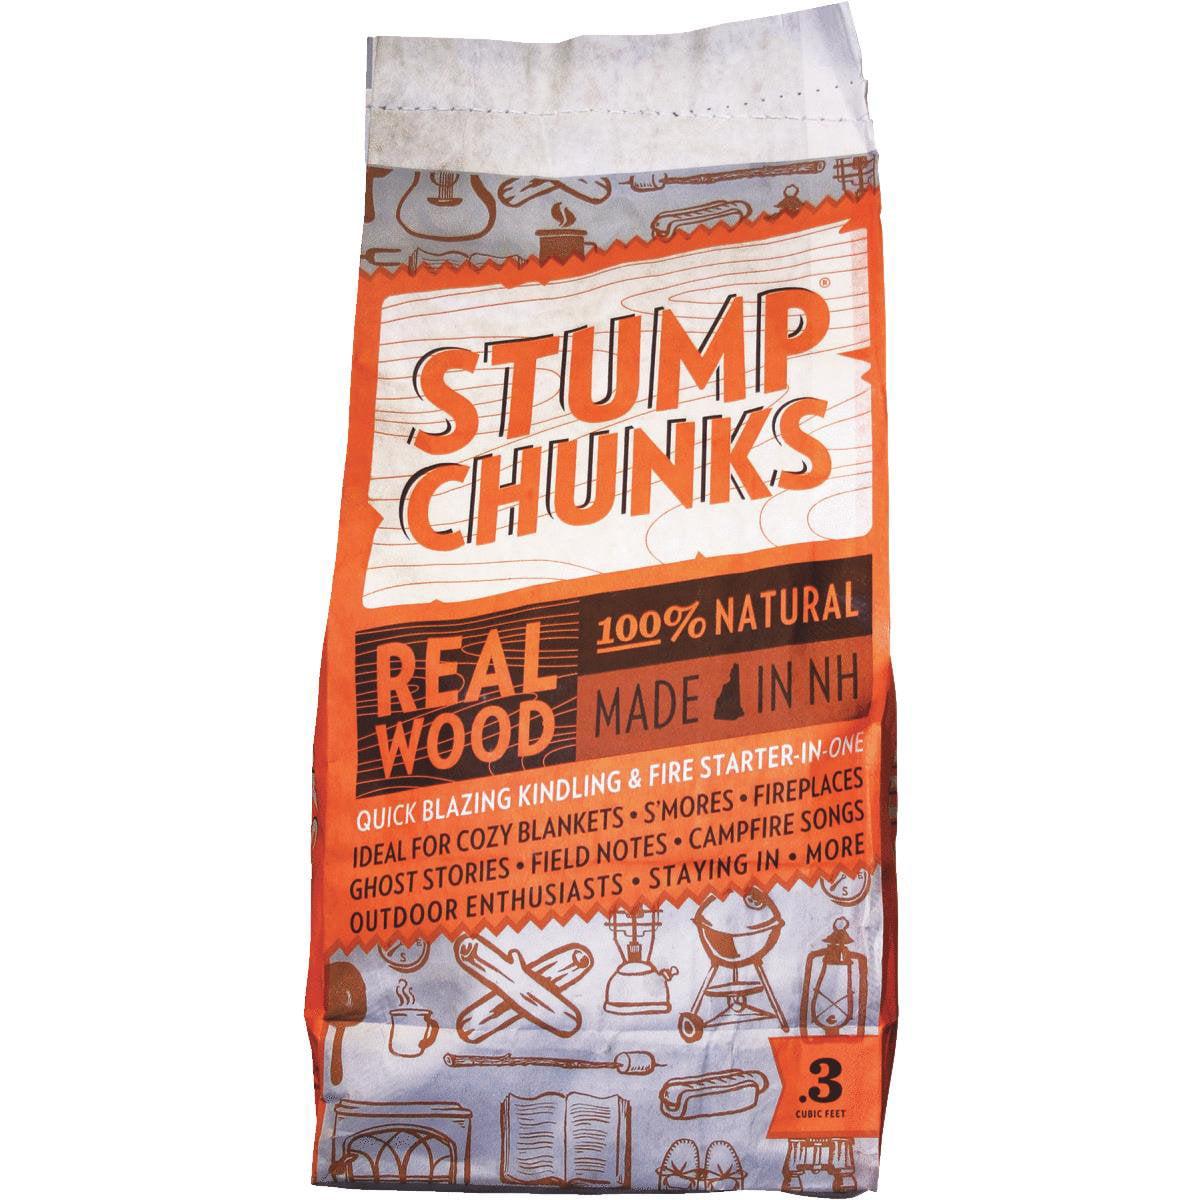 Stump Chunks Kindling & Fire Starter by Stump Chunks